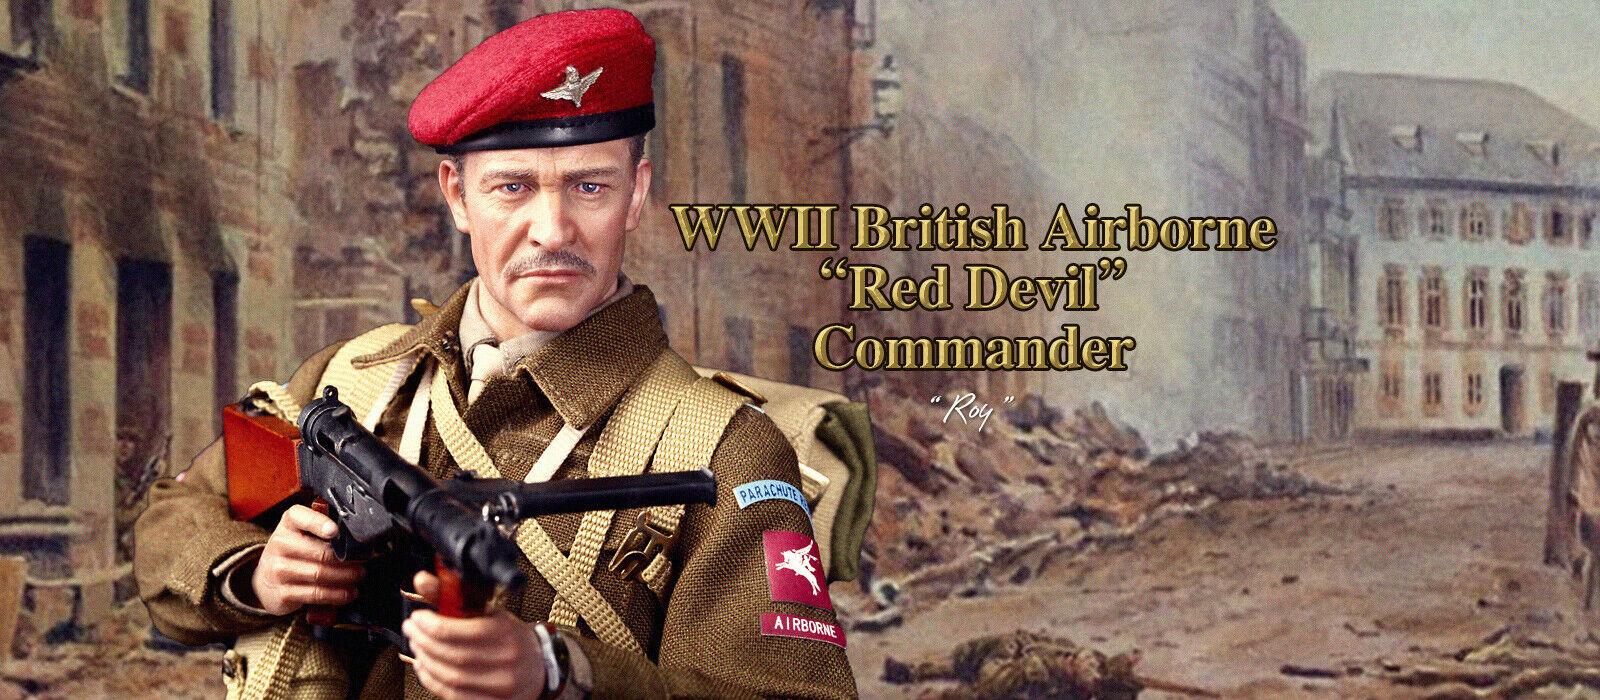 Hizo Roy Segunda Guerra Mundial 1st Británico Aerojoransportado Rojo Devils comandante Sean Connery escala 1 6